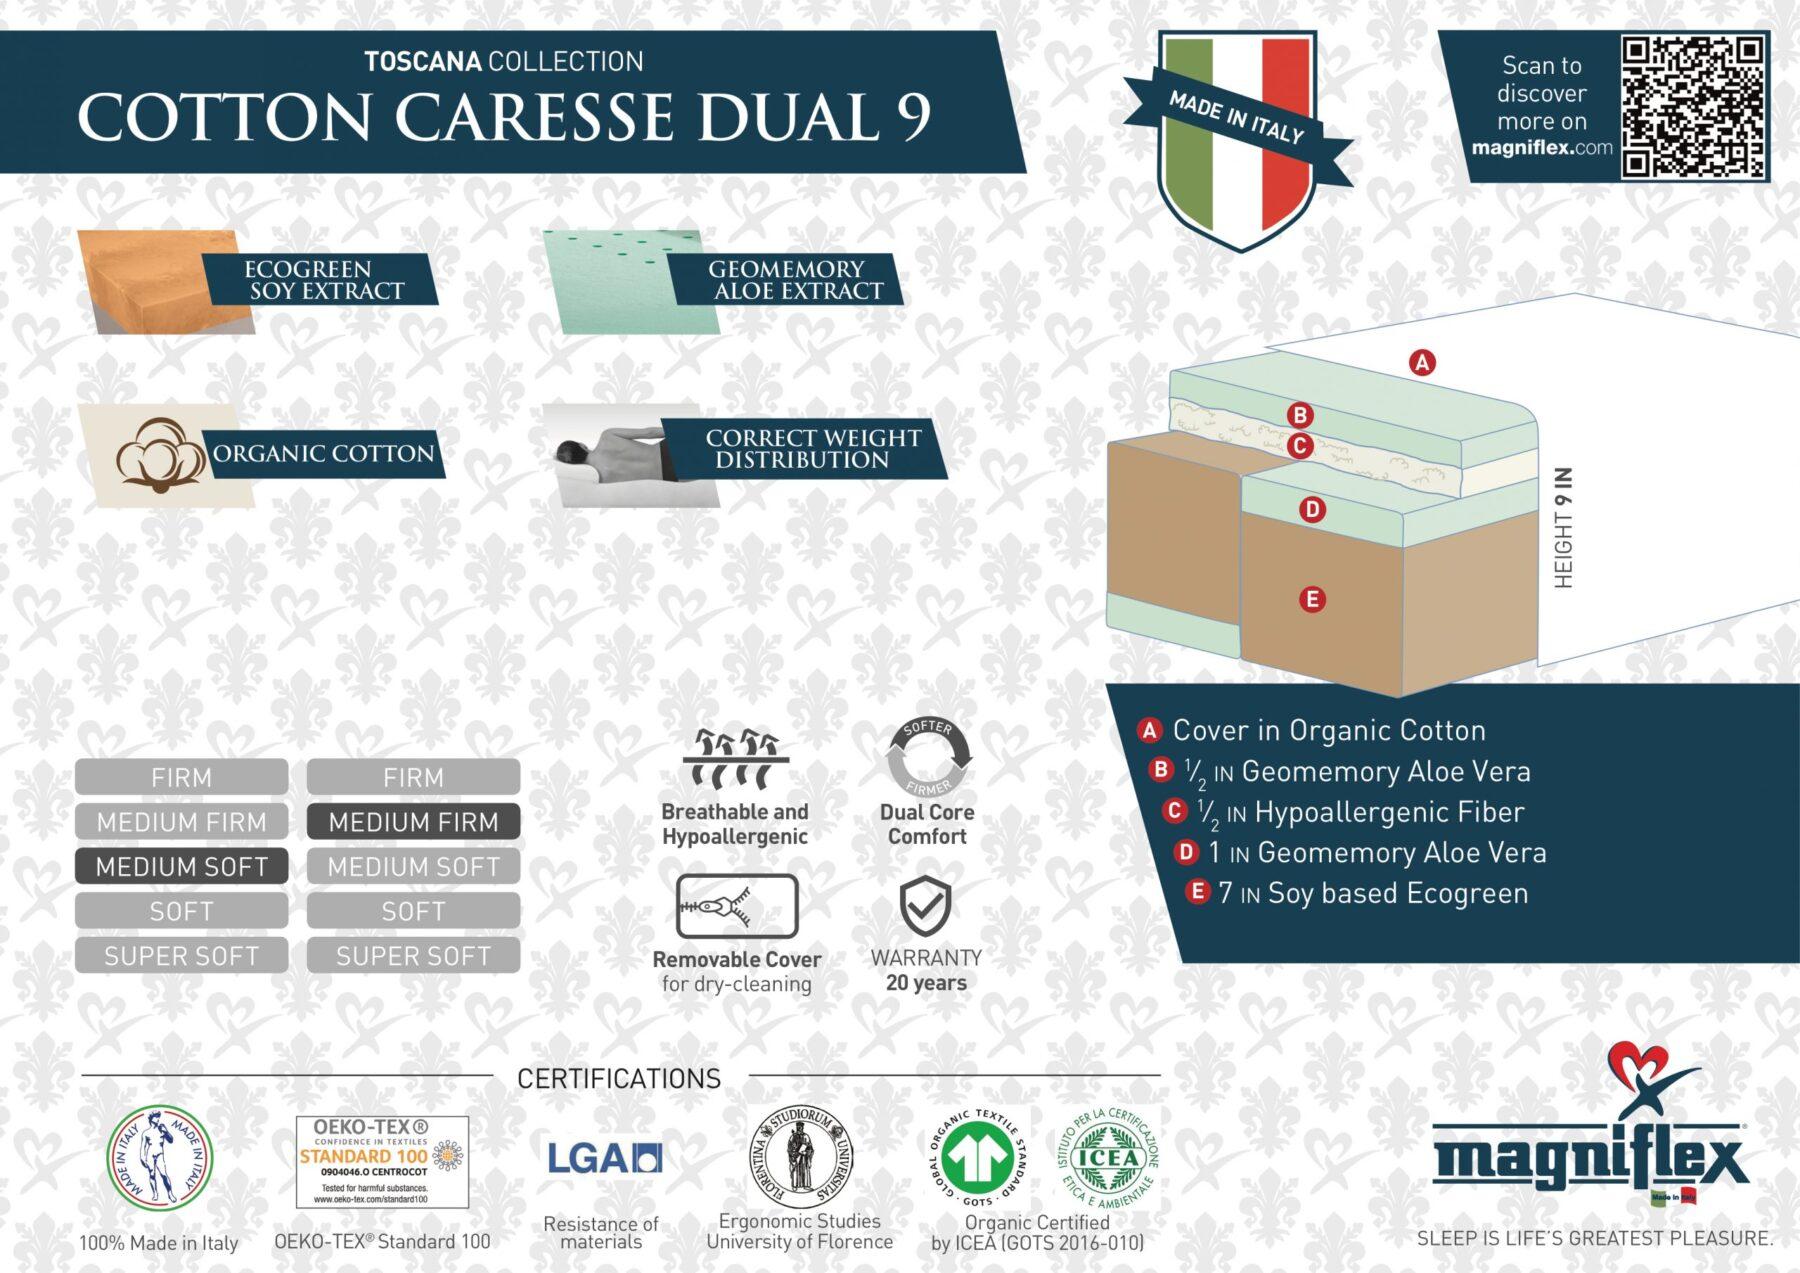 Cotton Caresse Dual 9 Insert